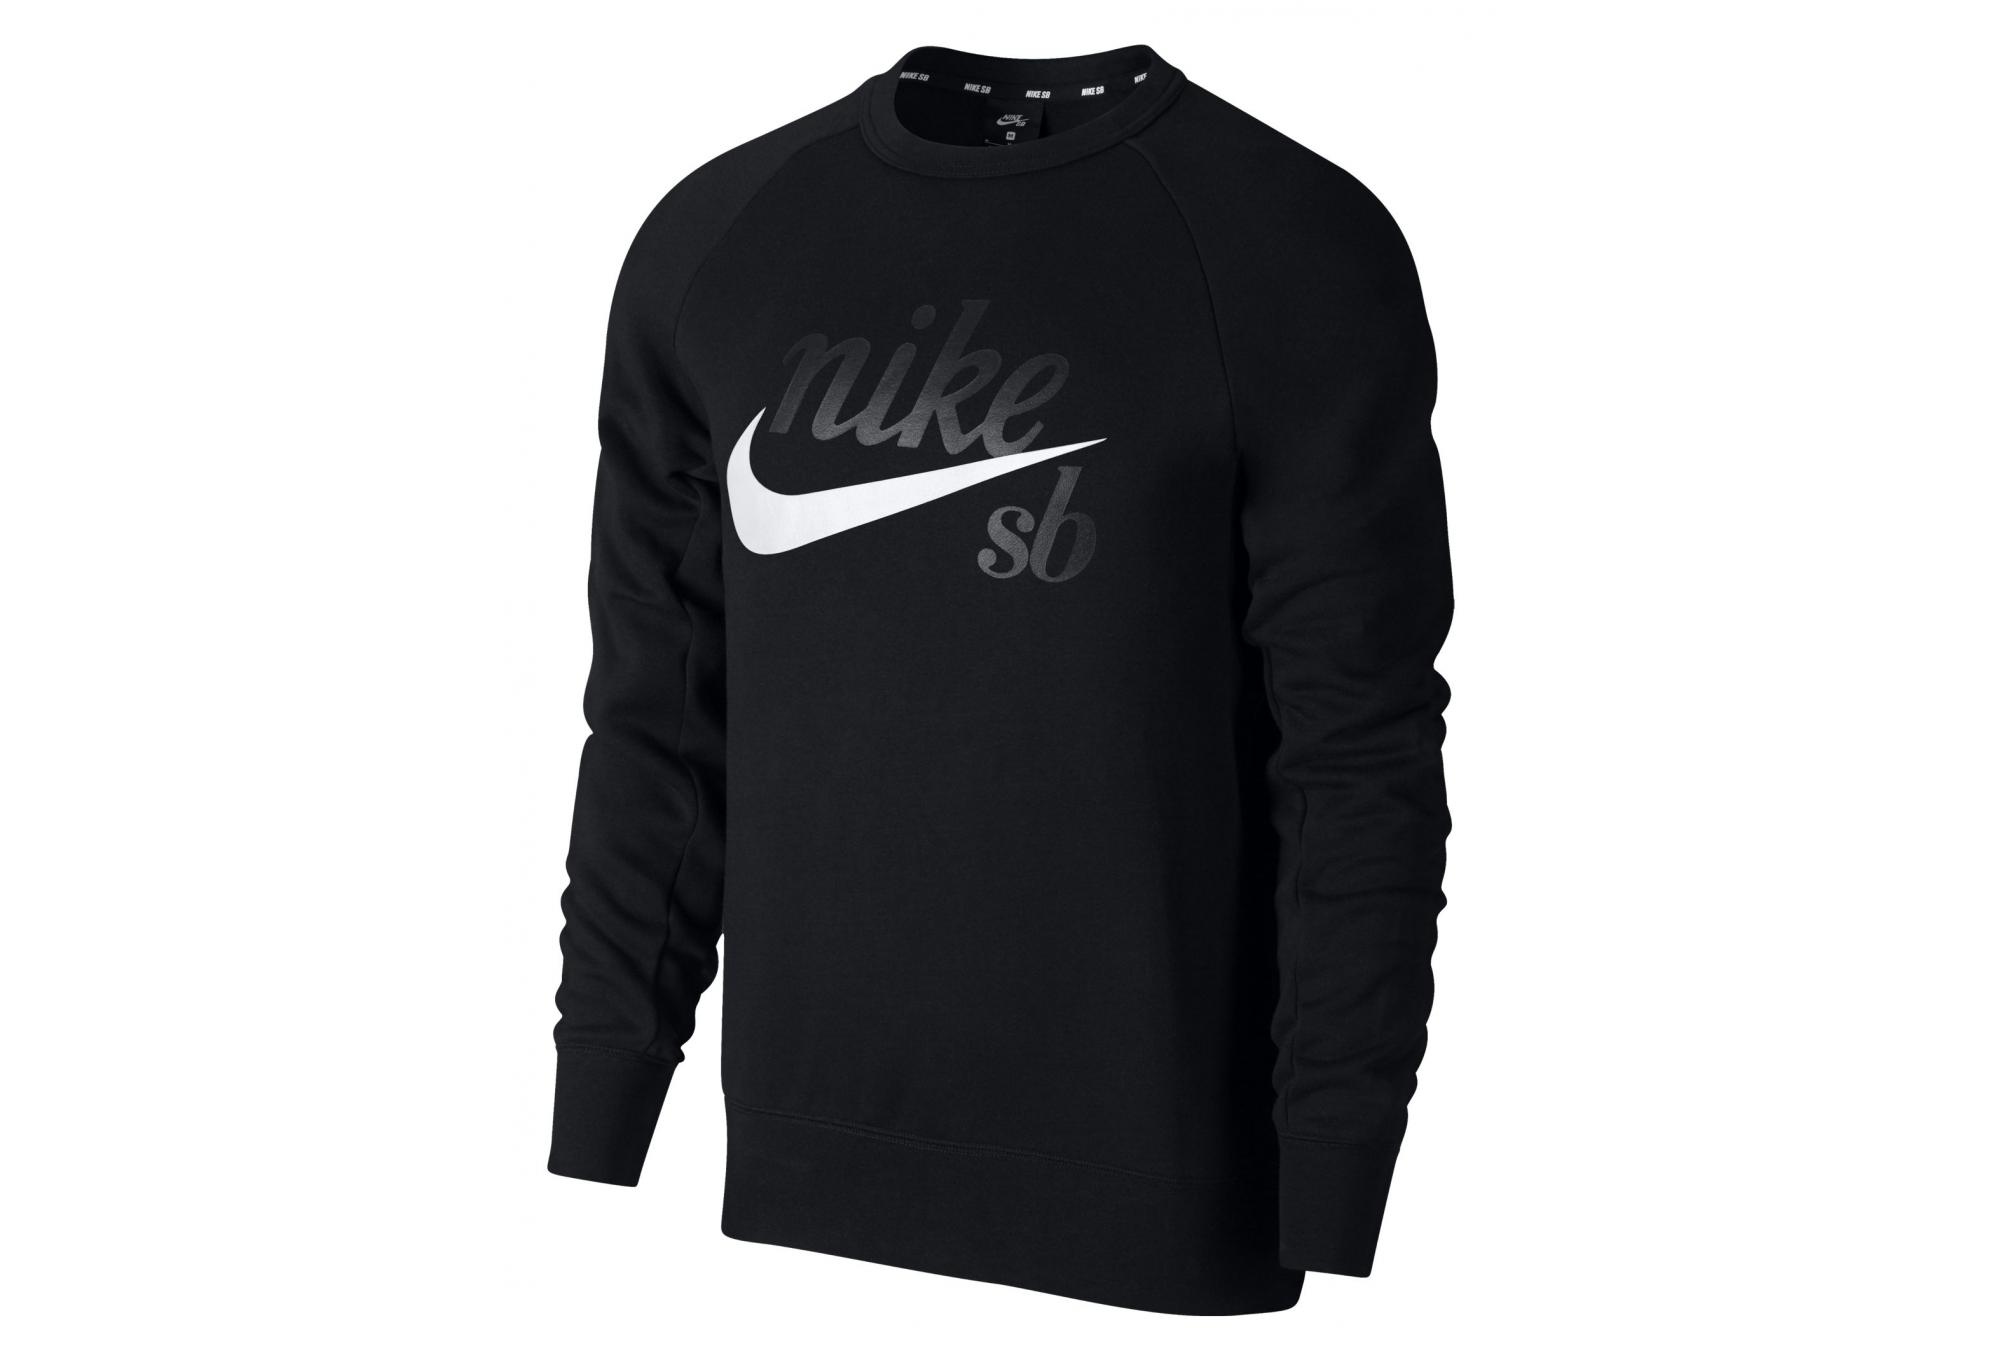 Nike SB Icon Sweat Black White   Alltricks.com 1a50cdc231fd